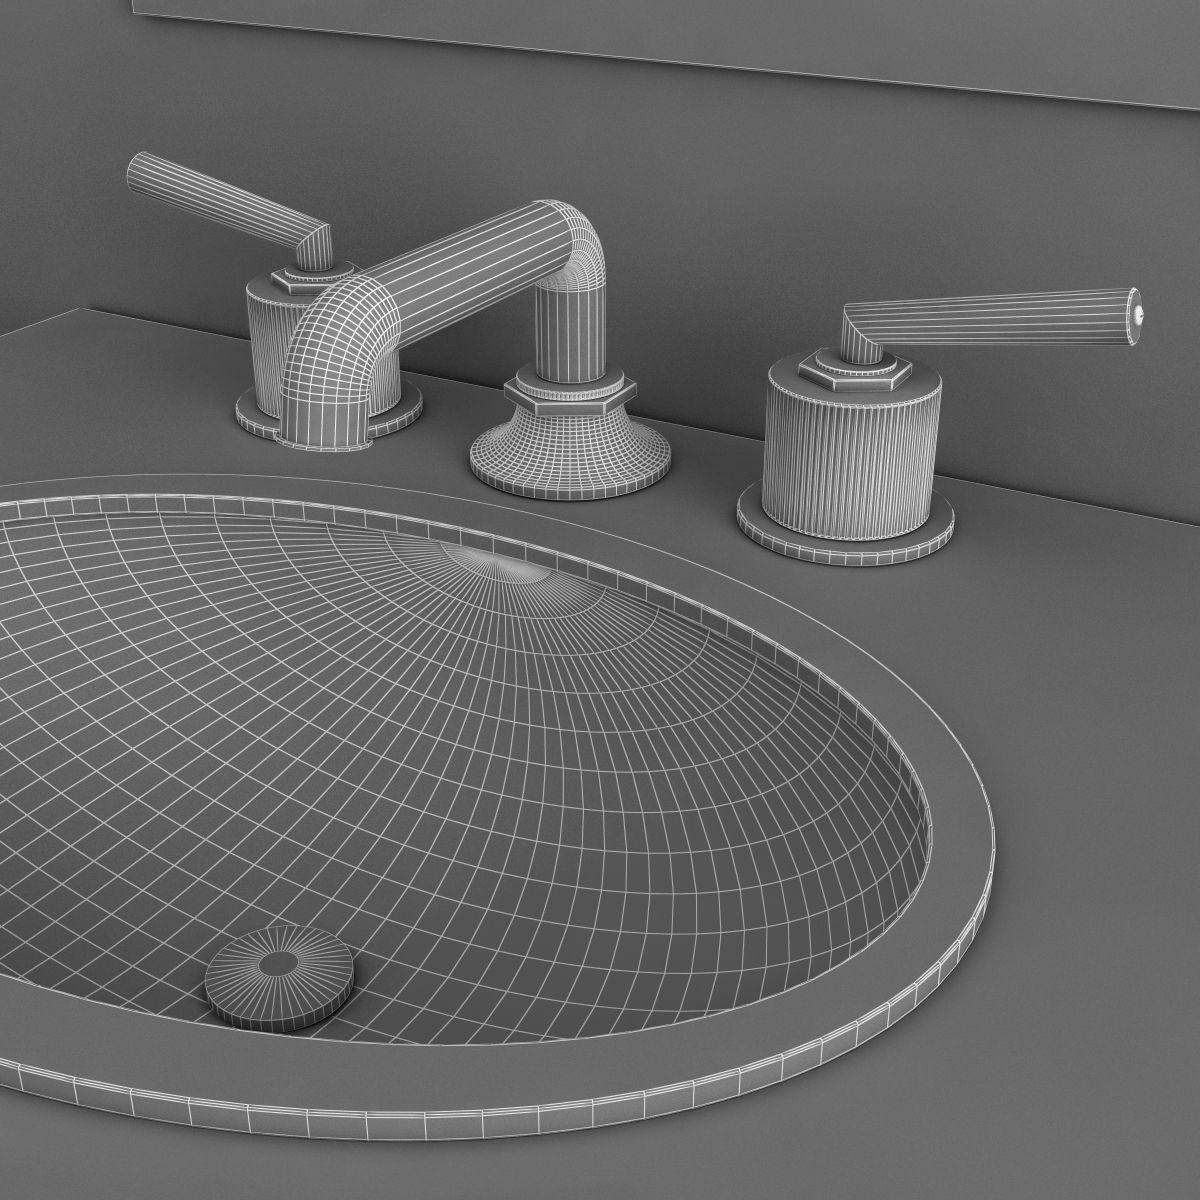 ... Waterworks Bathroom Furniture Set 3d Model Max Obj Mtl 3ds Fbx 5 ...